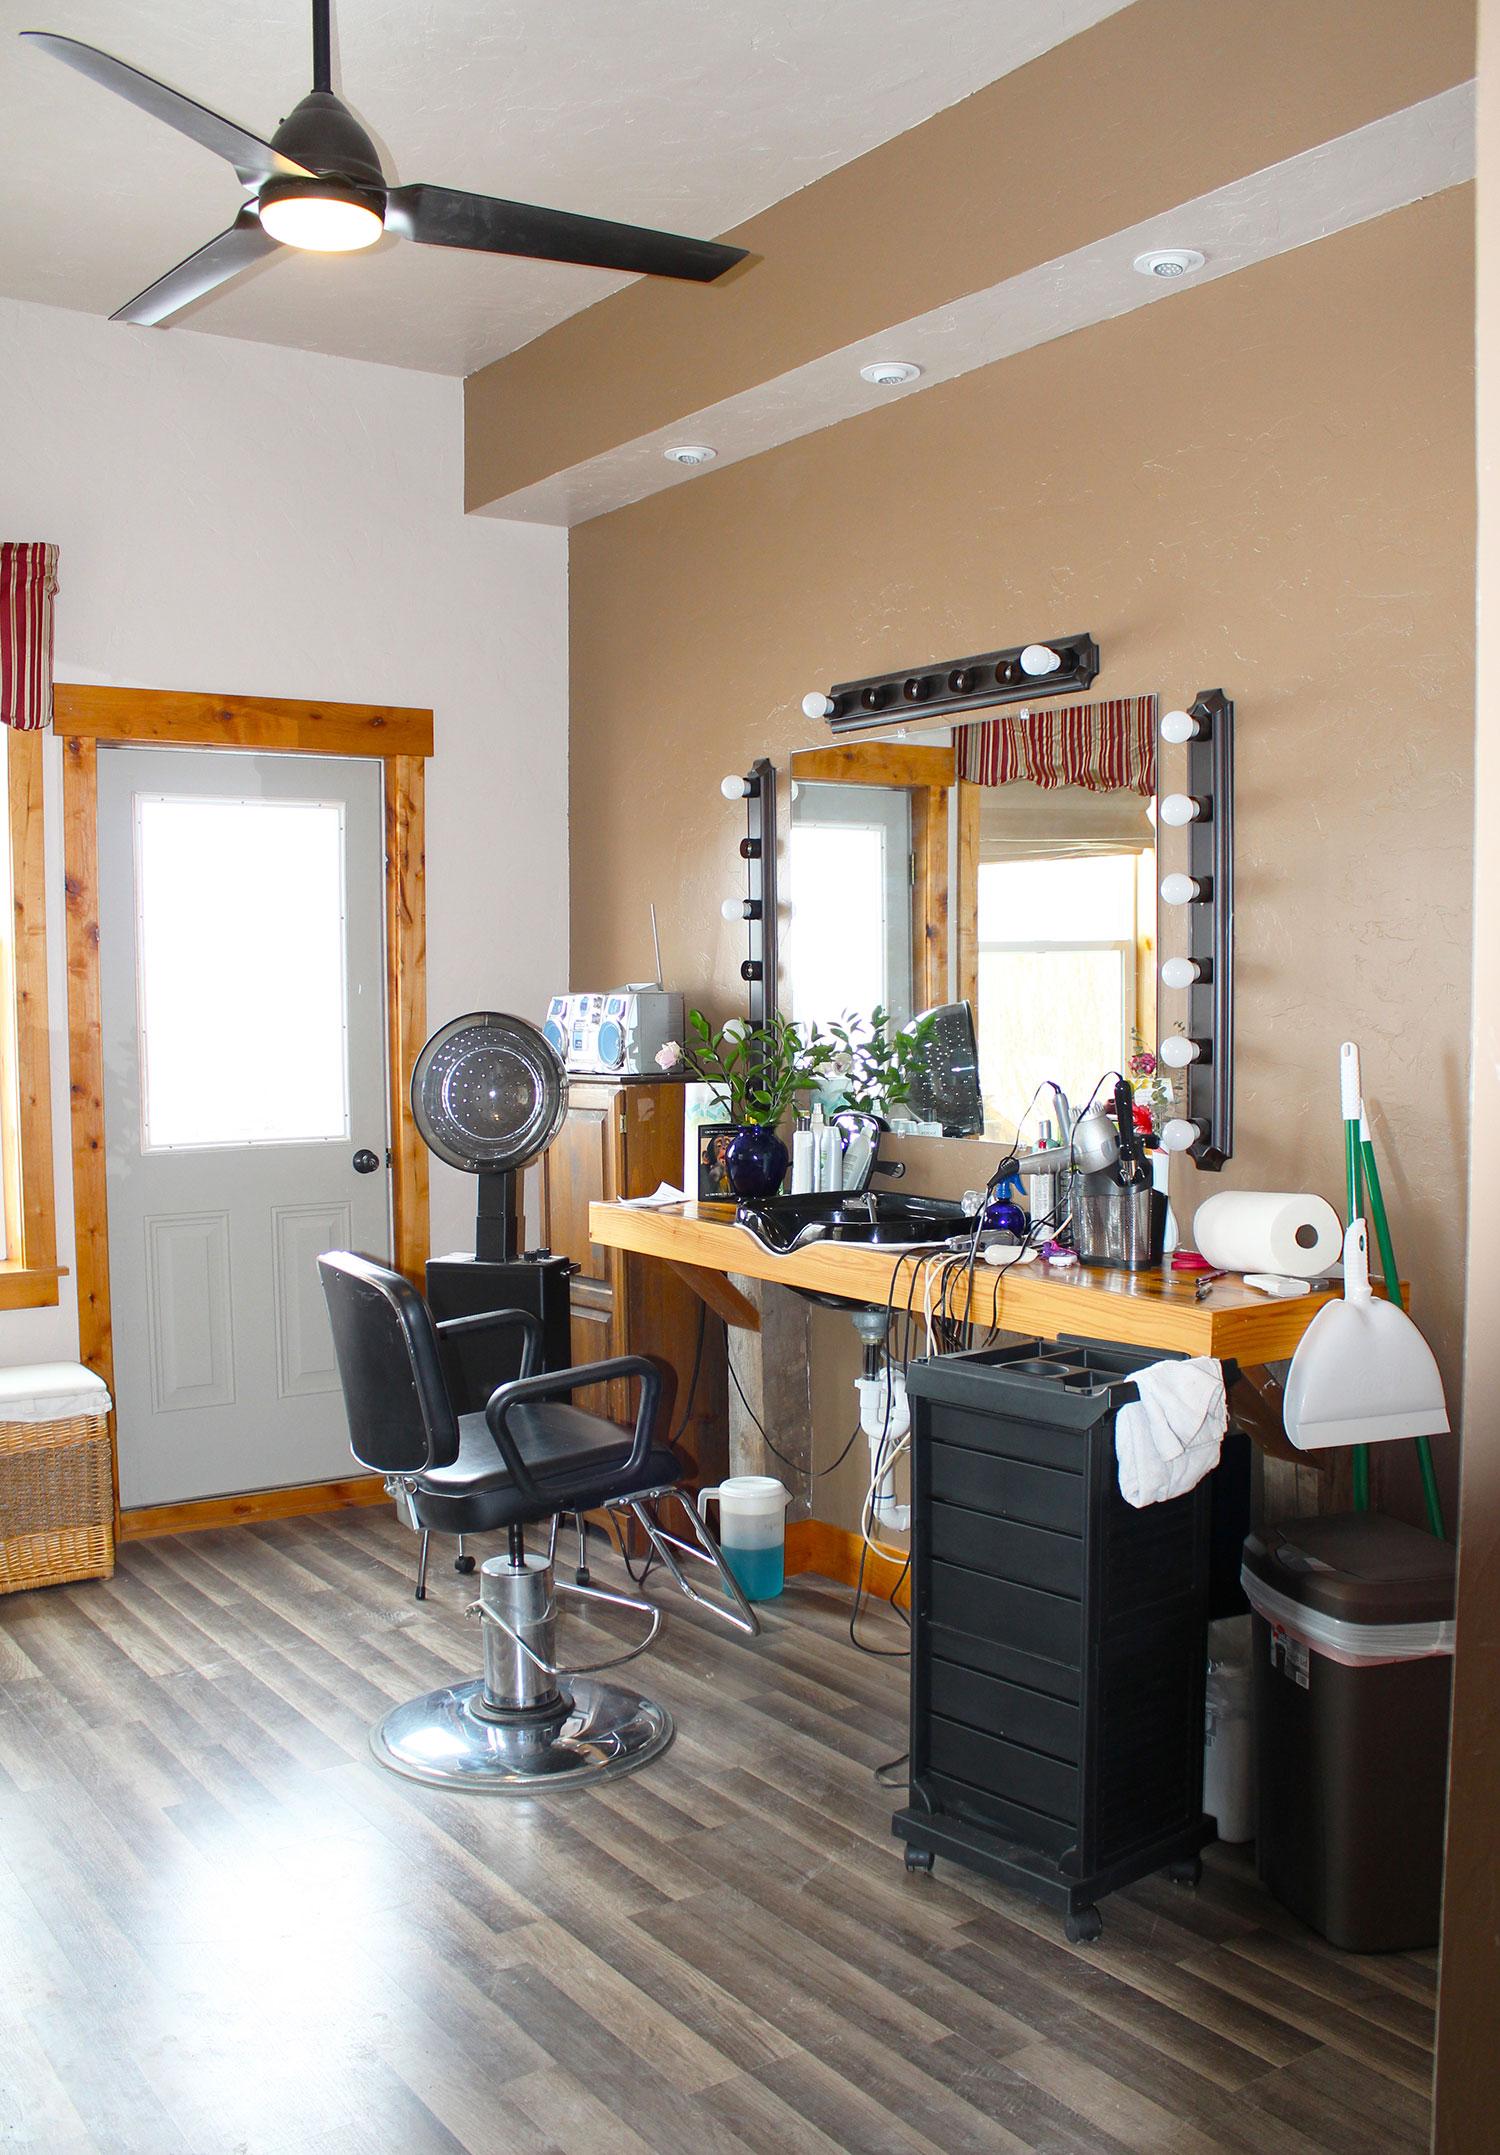 Ovando_Inn_0002_Beauty_Shop.jpg